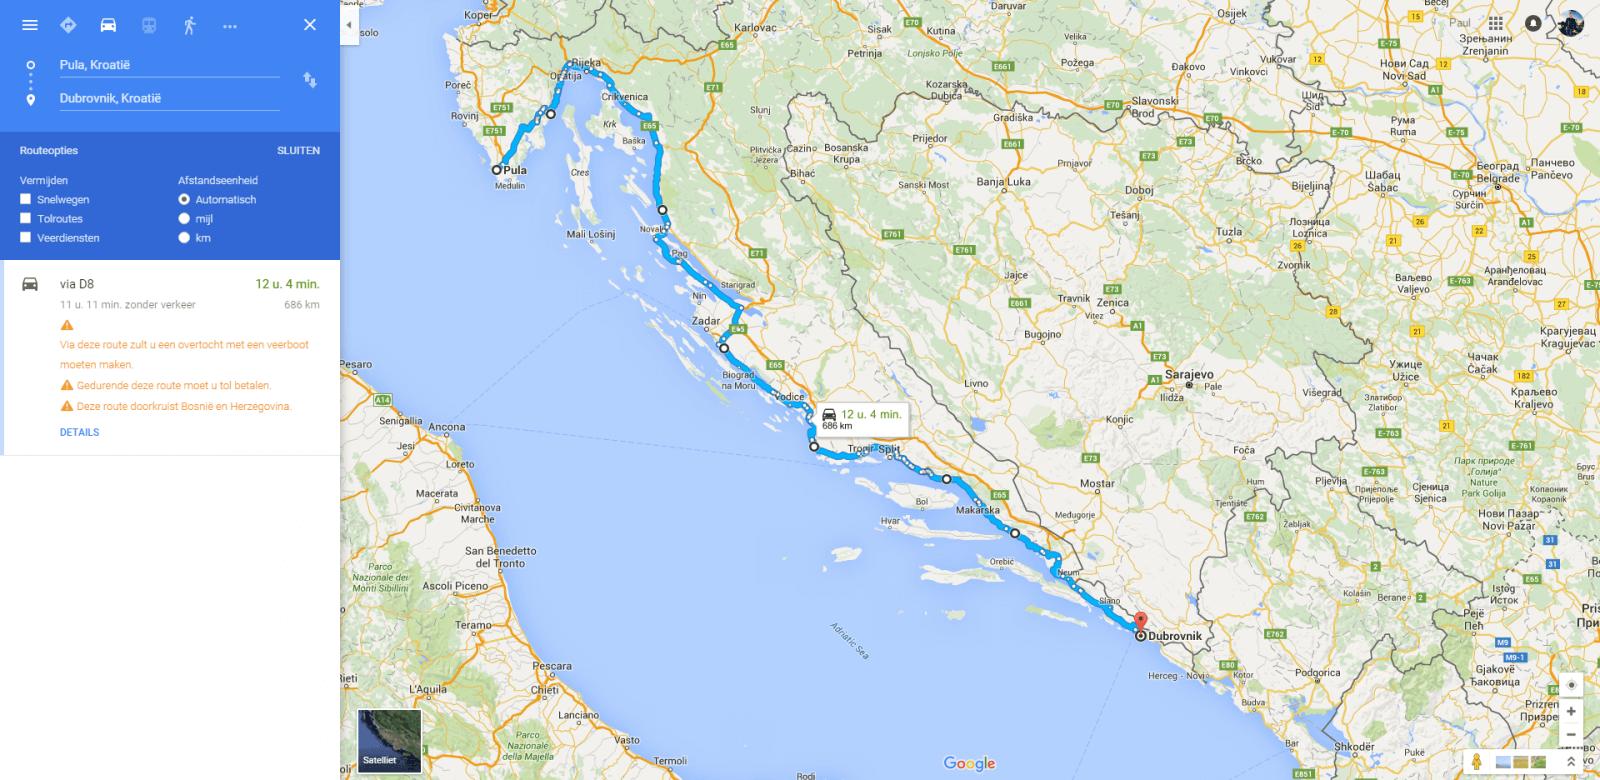 motorvakantie kustroute kroatie